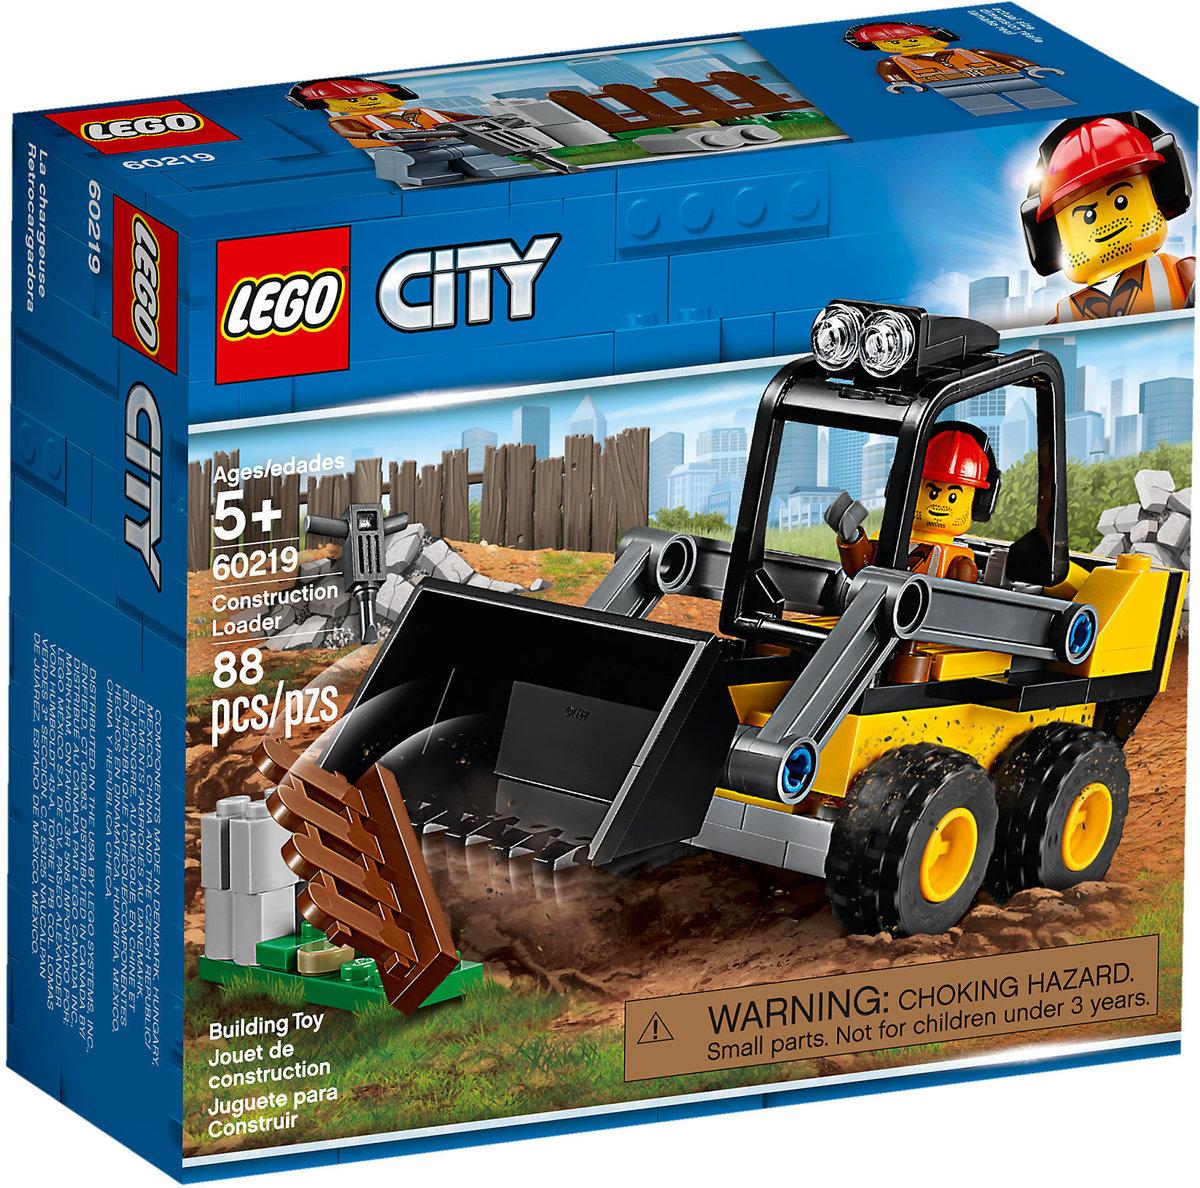 LEGO 60219 City - Construction Loader